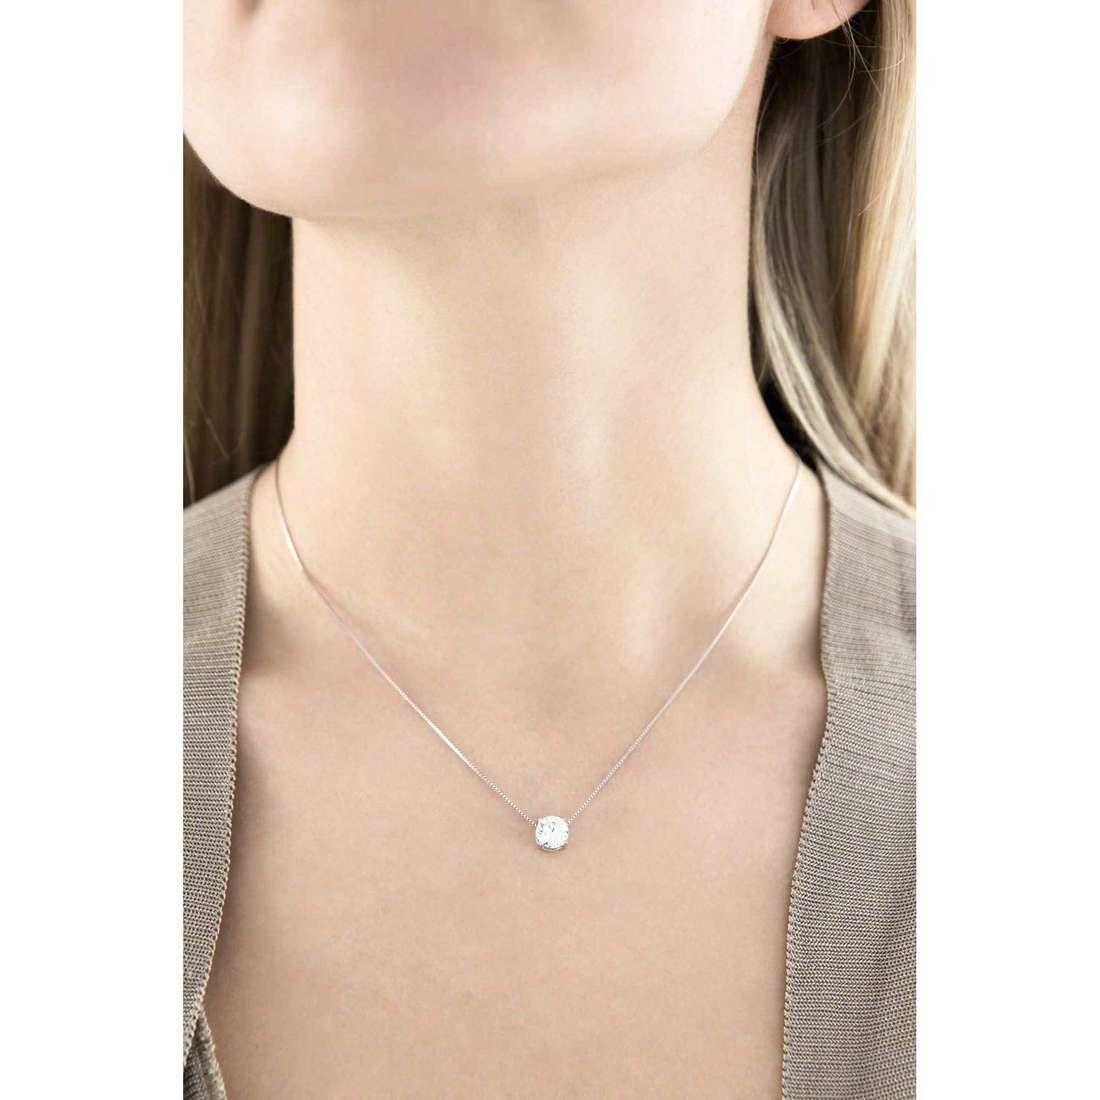 GioiaPura colliers femme 28915-01-00 indosso